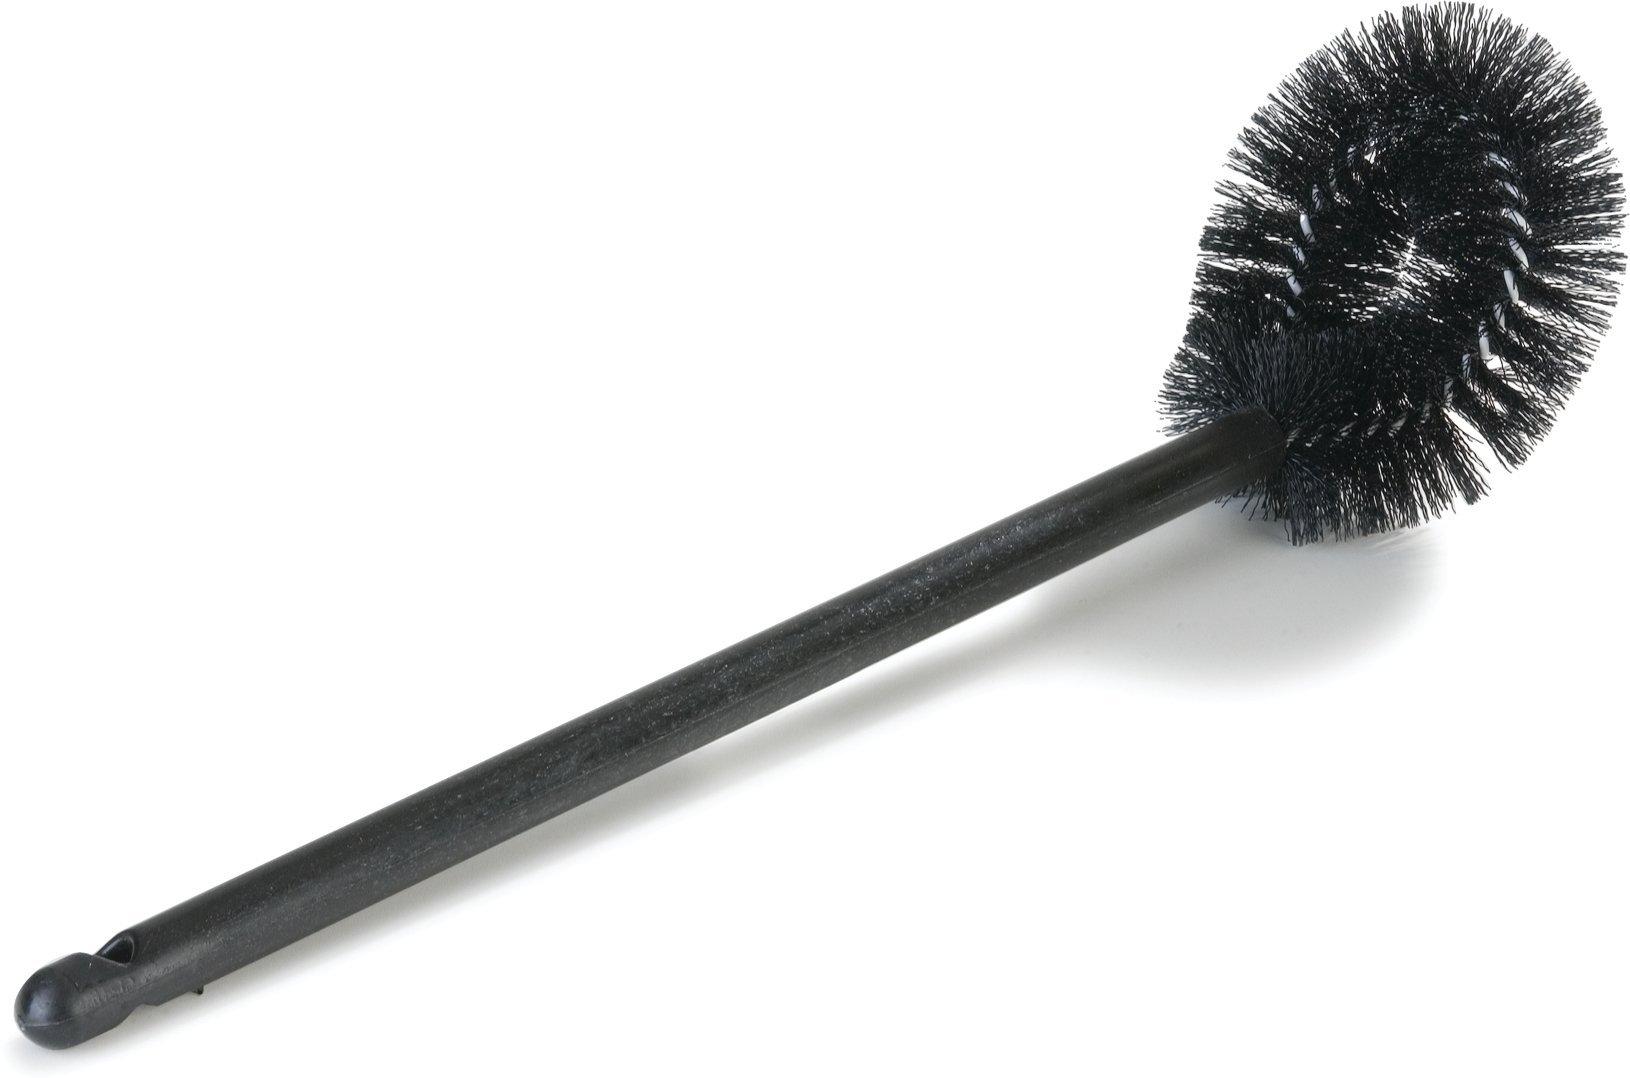 Carlisle 3631303 Plastic Handle Bowl Brush, Nylon Bristles, 5-1/2'' Length x 4-1/2 Width Brush, 20'' Length, Black (Case of 24) by Carlisle (Image #1)